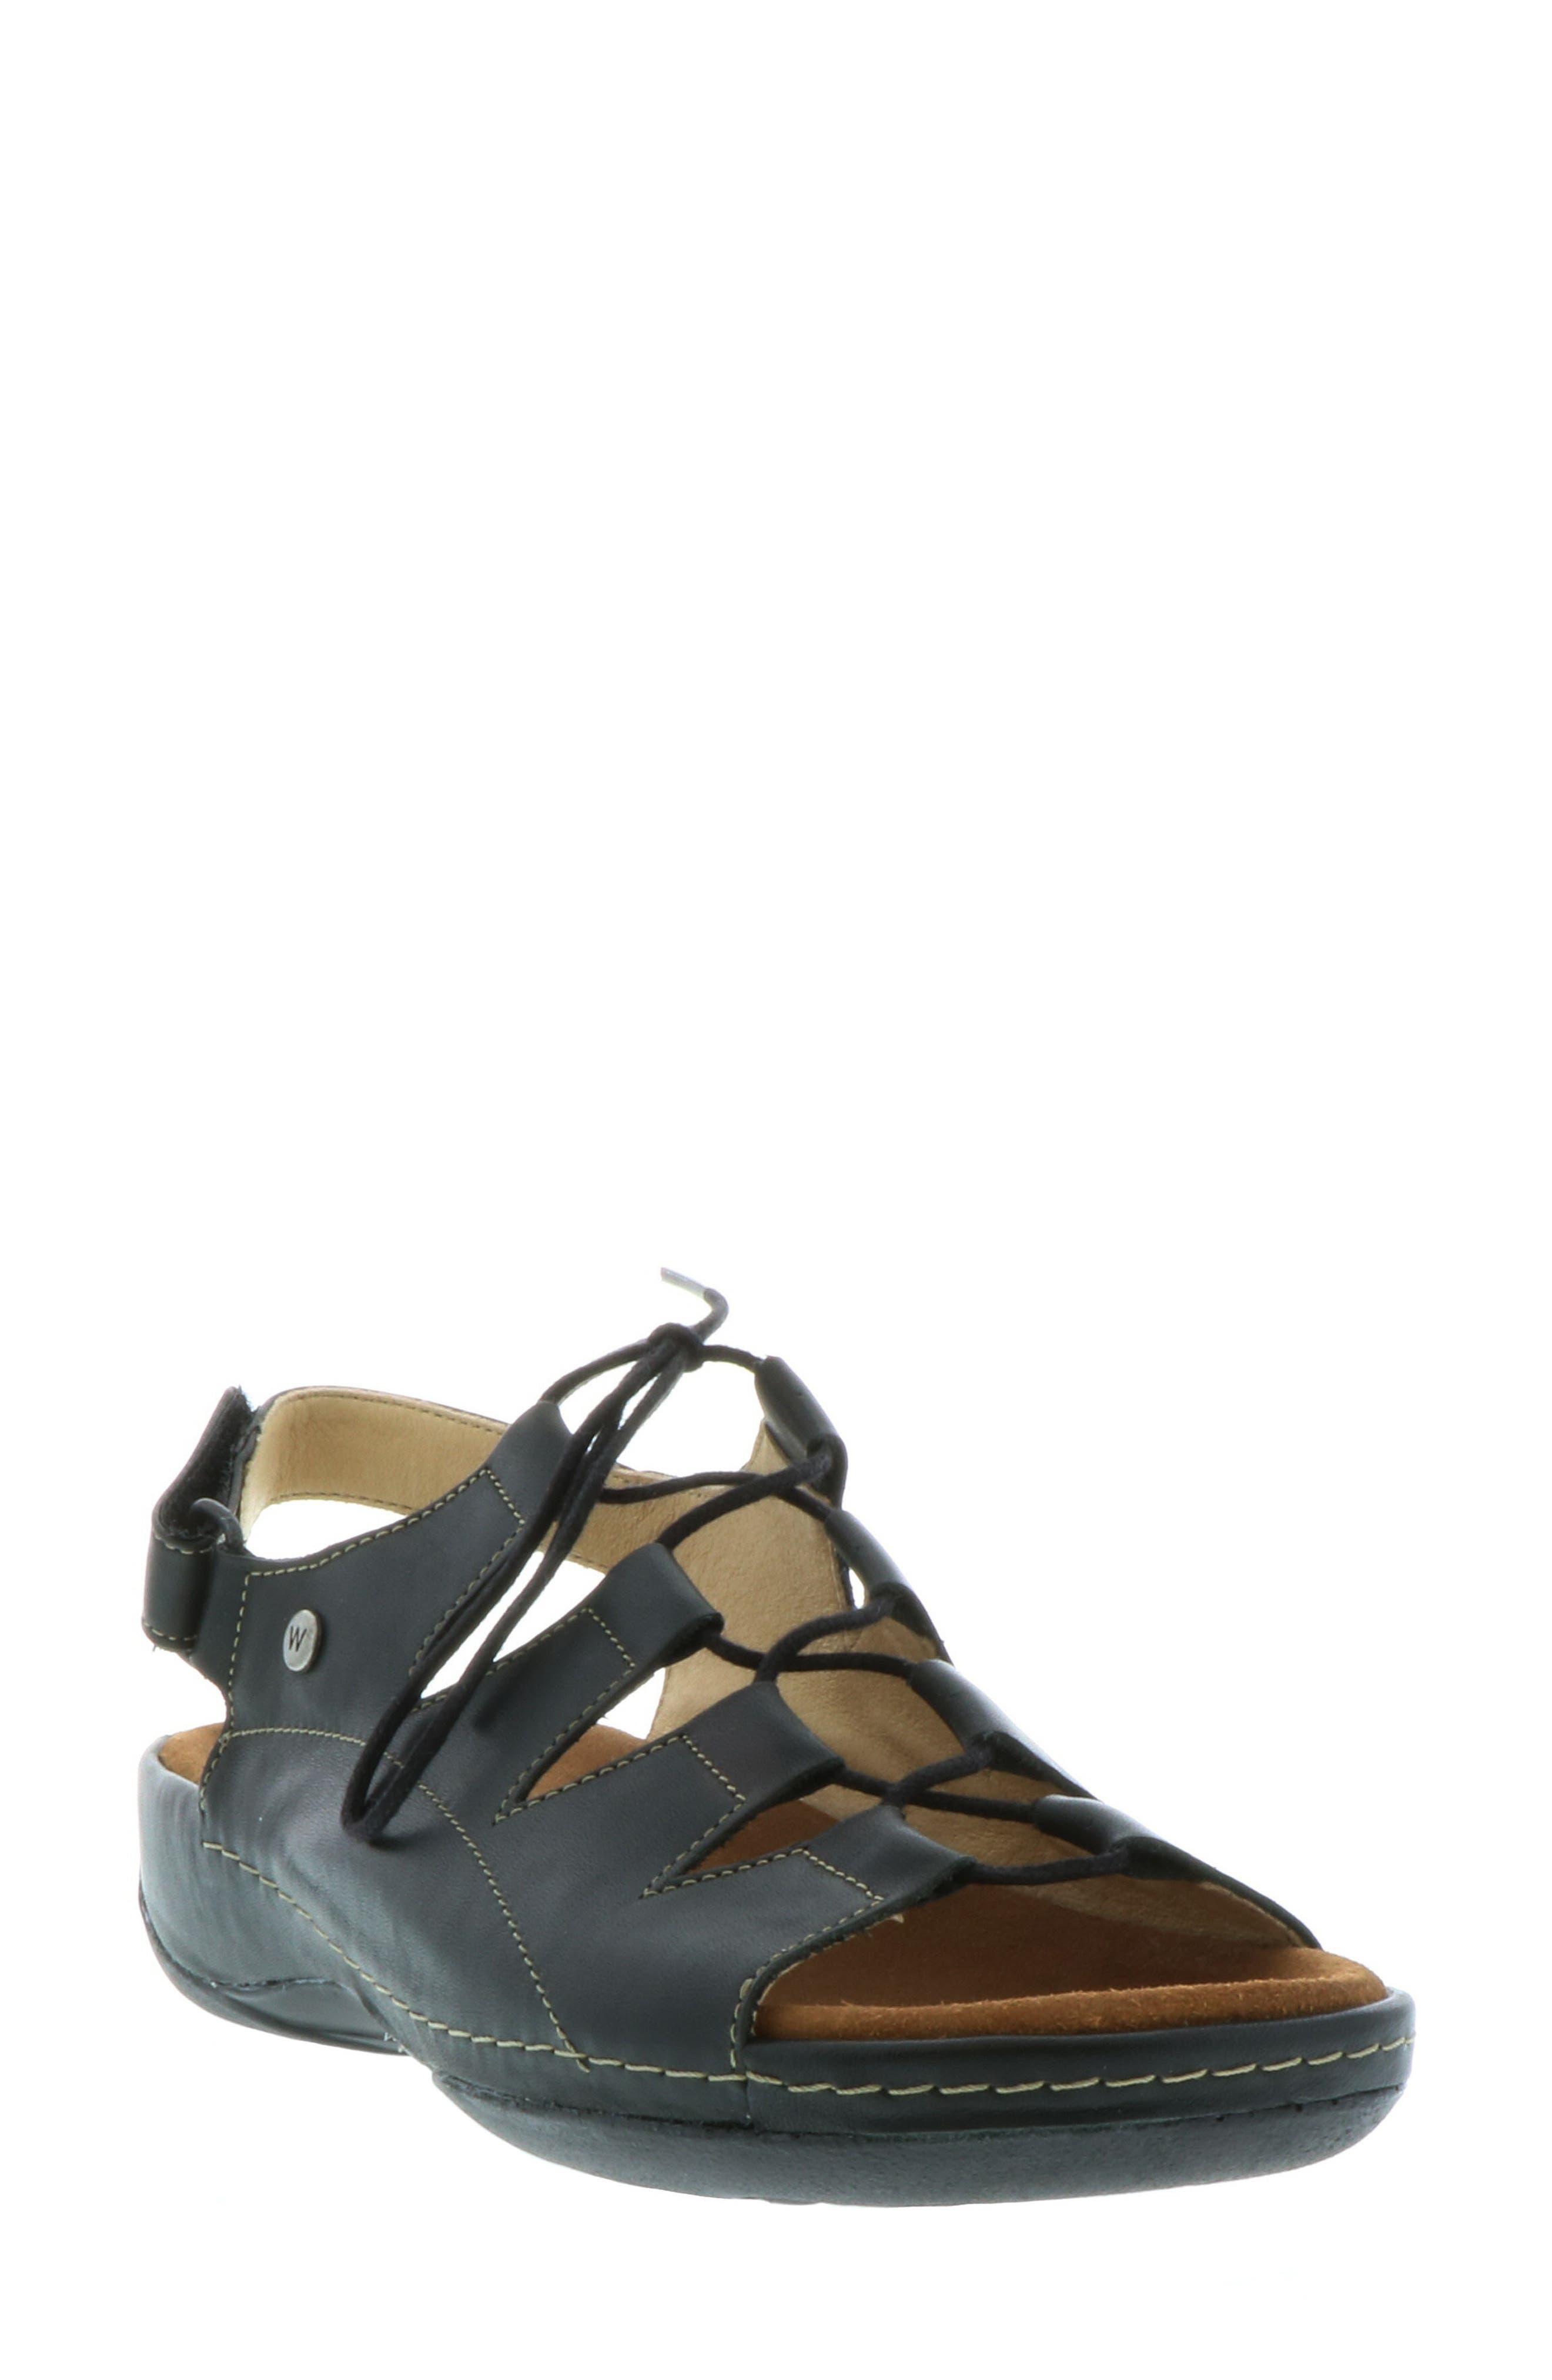 Kite Lace-Up Sandal,                         Main,                         color, BLACK LEATHER